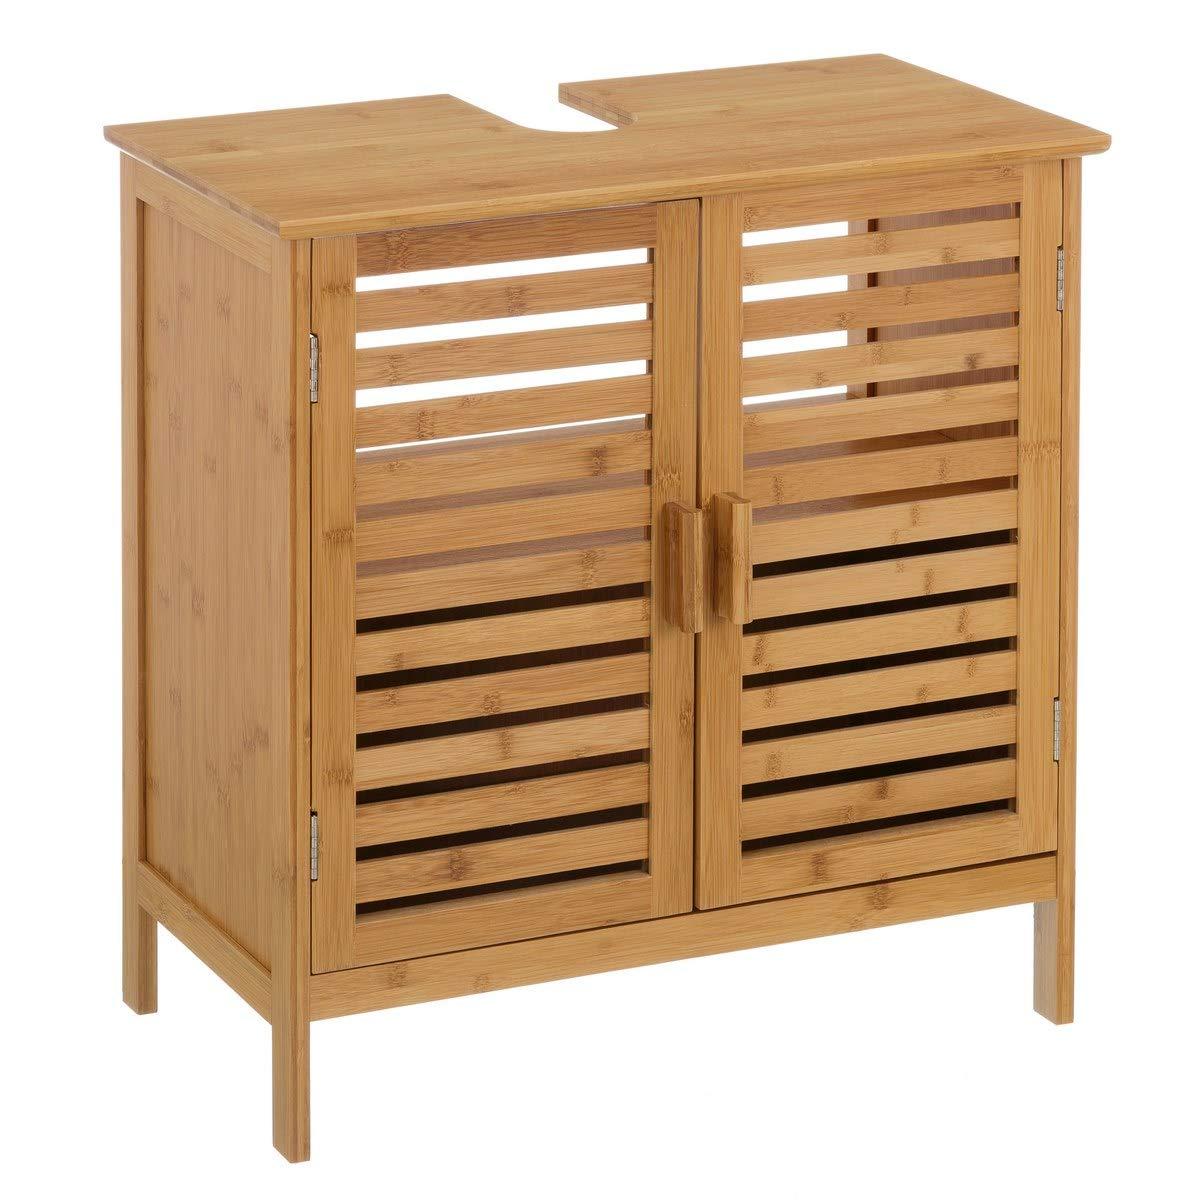 Mueble bajo Lavabo de bambú